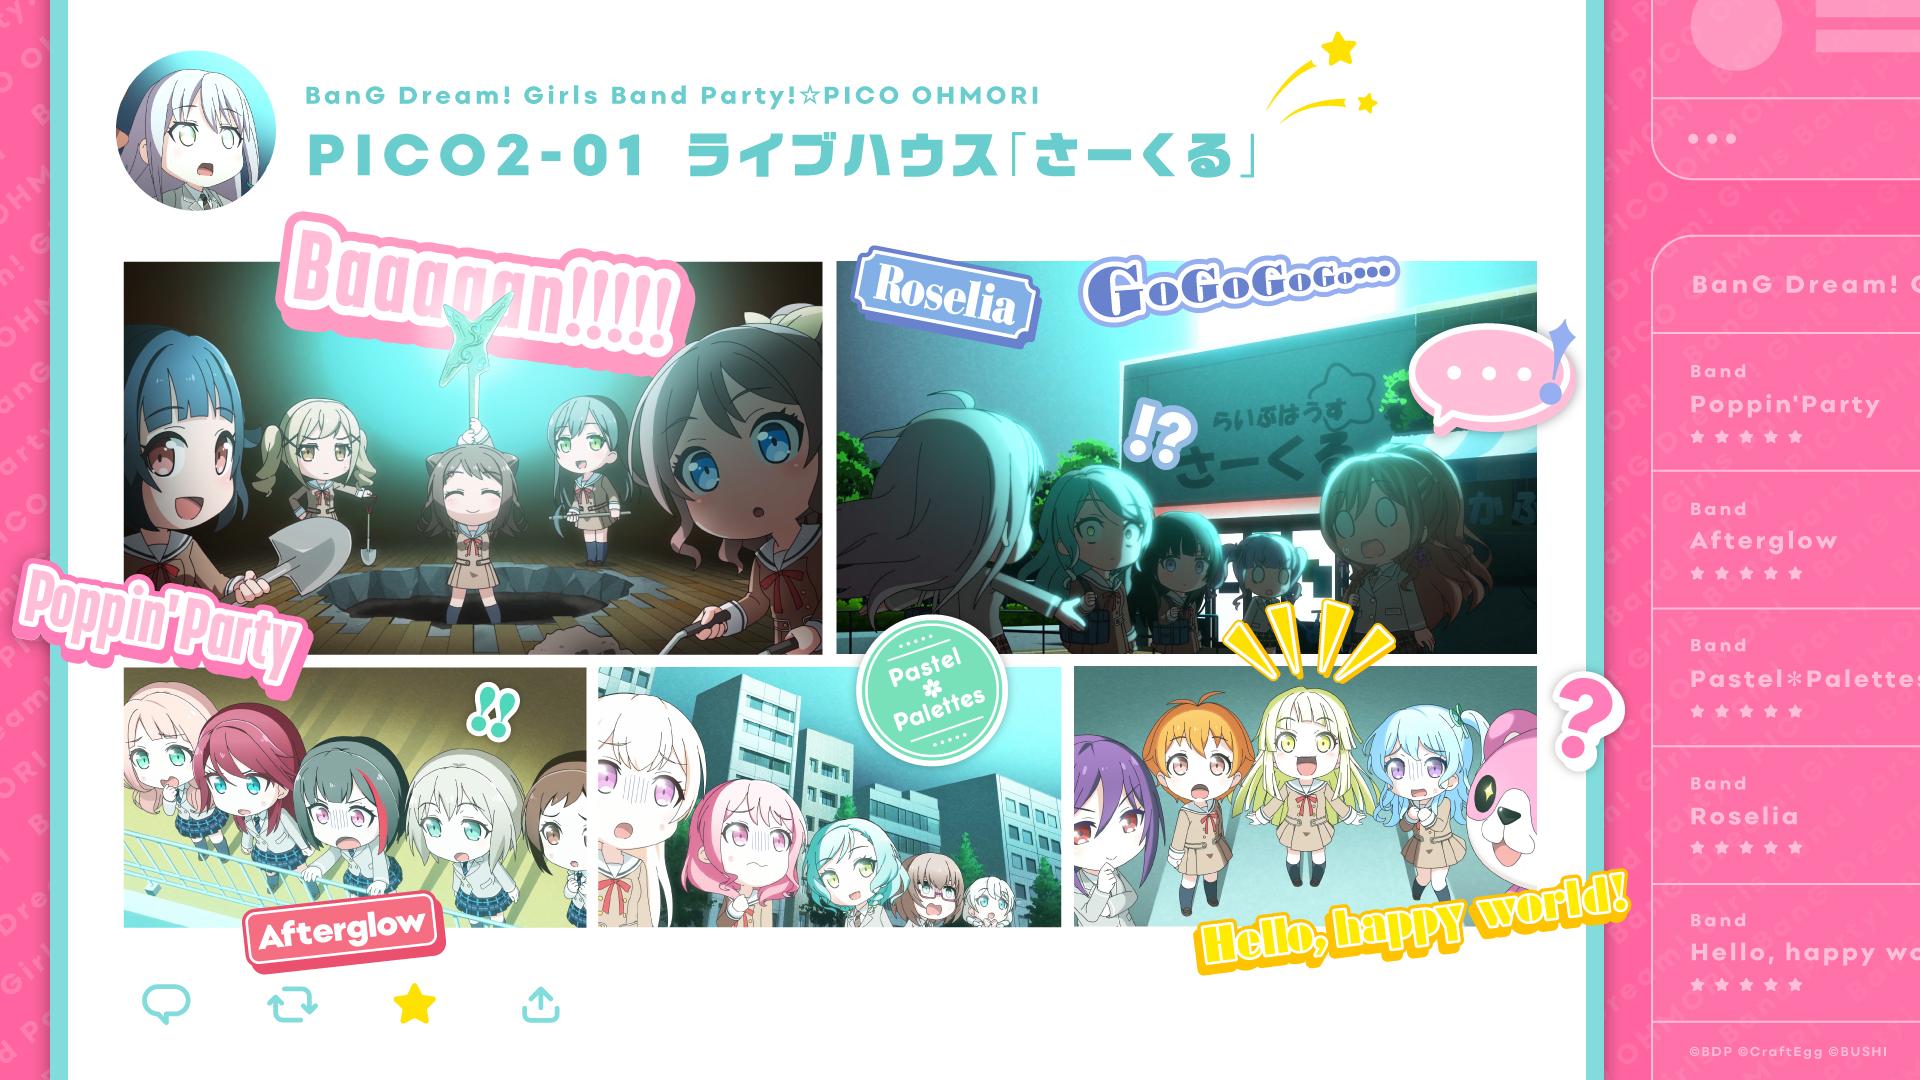 Pico2 01壁紙プレゼント Bang Dream ガルパ ピコ 大盛り 公式サイト